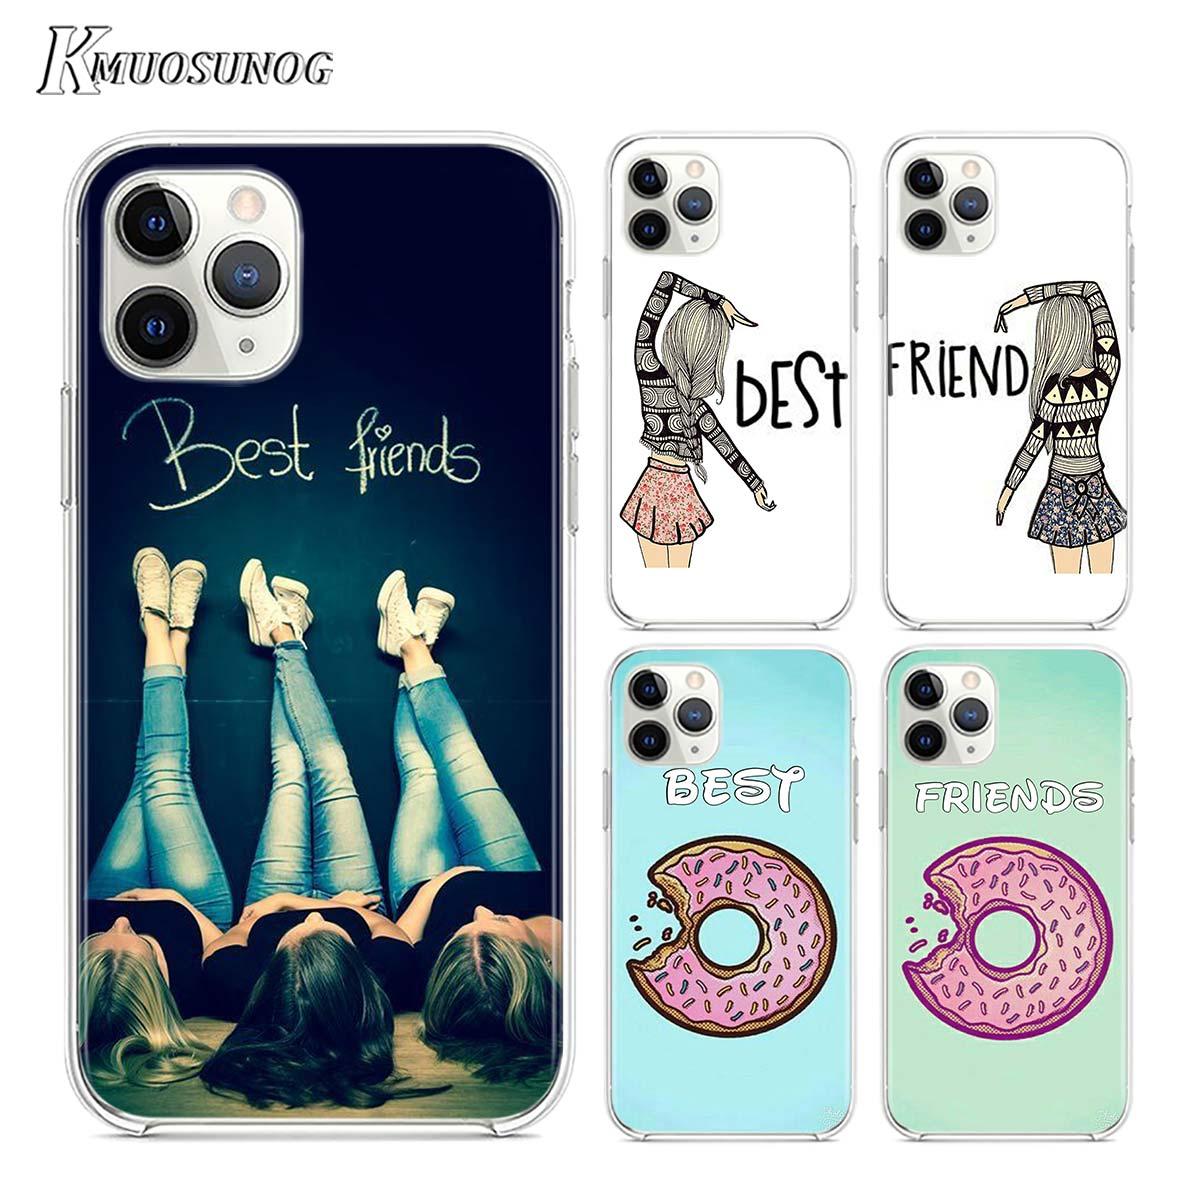 best friend cover iphone